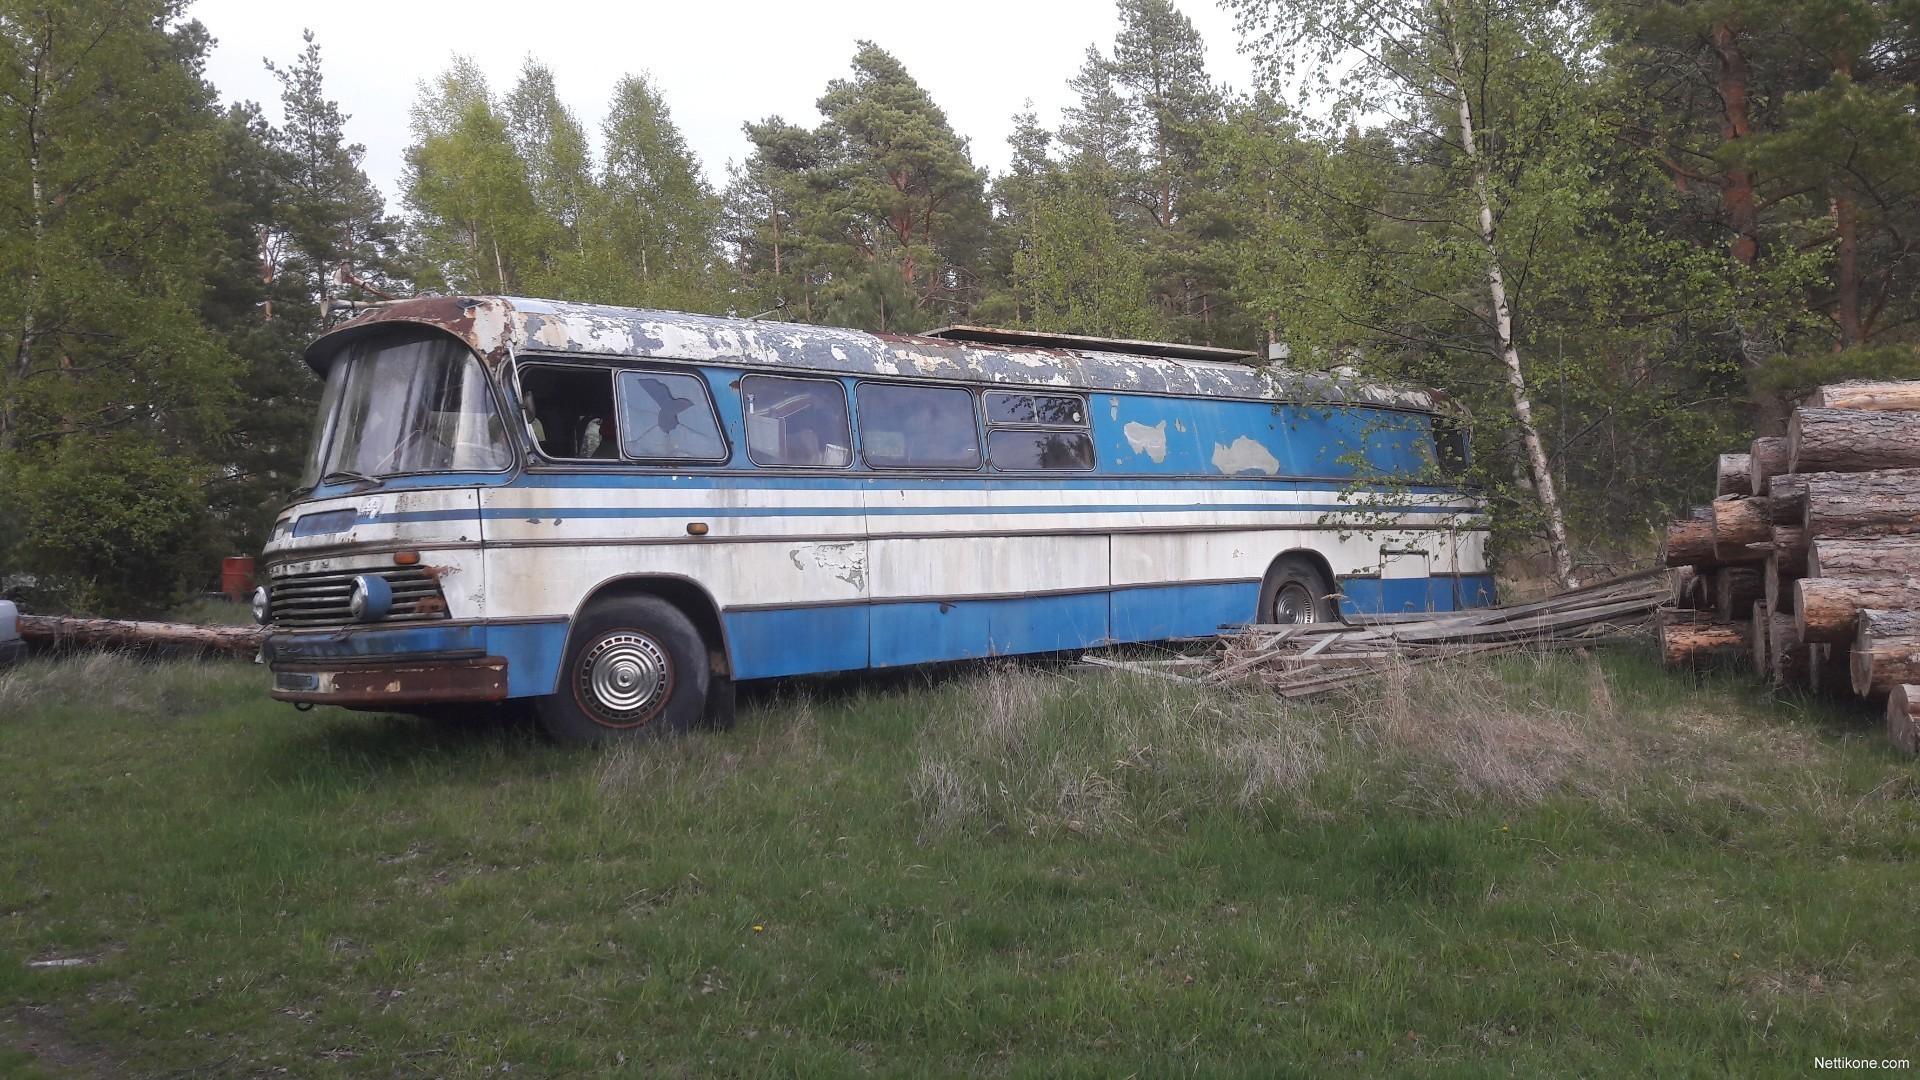 Scania vabis linja-auto - Nettikone